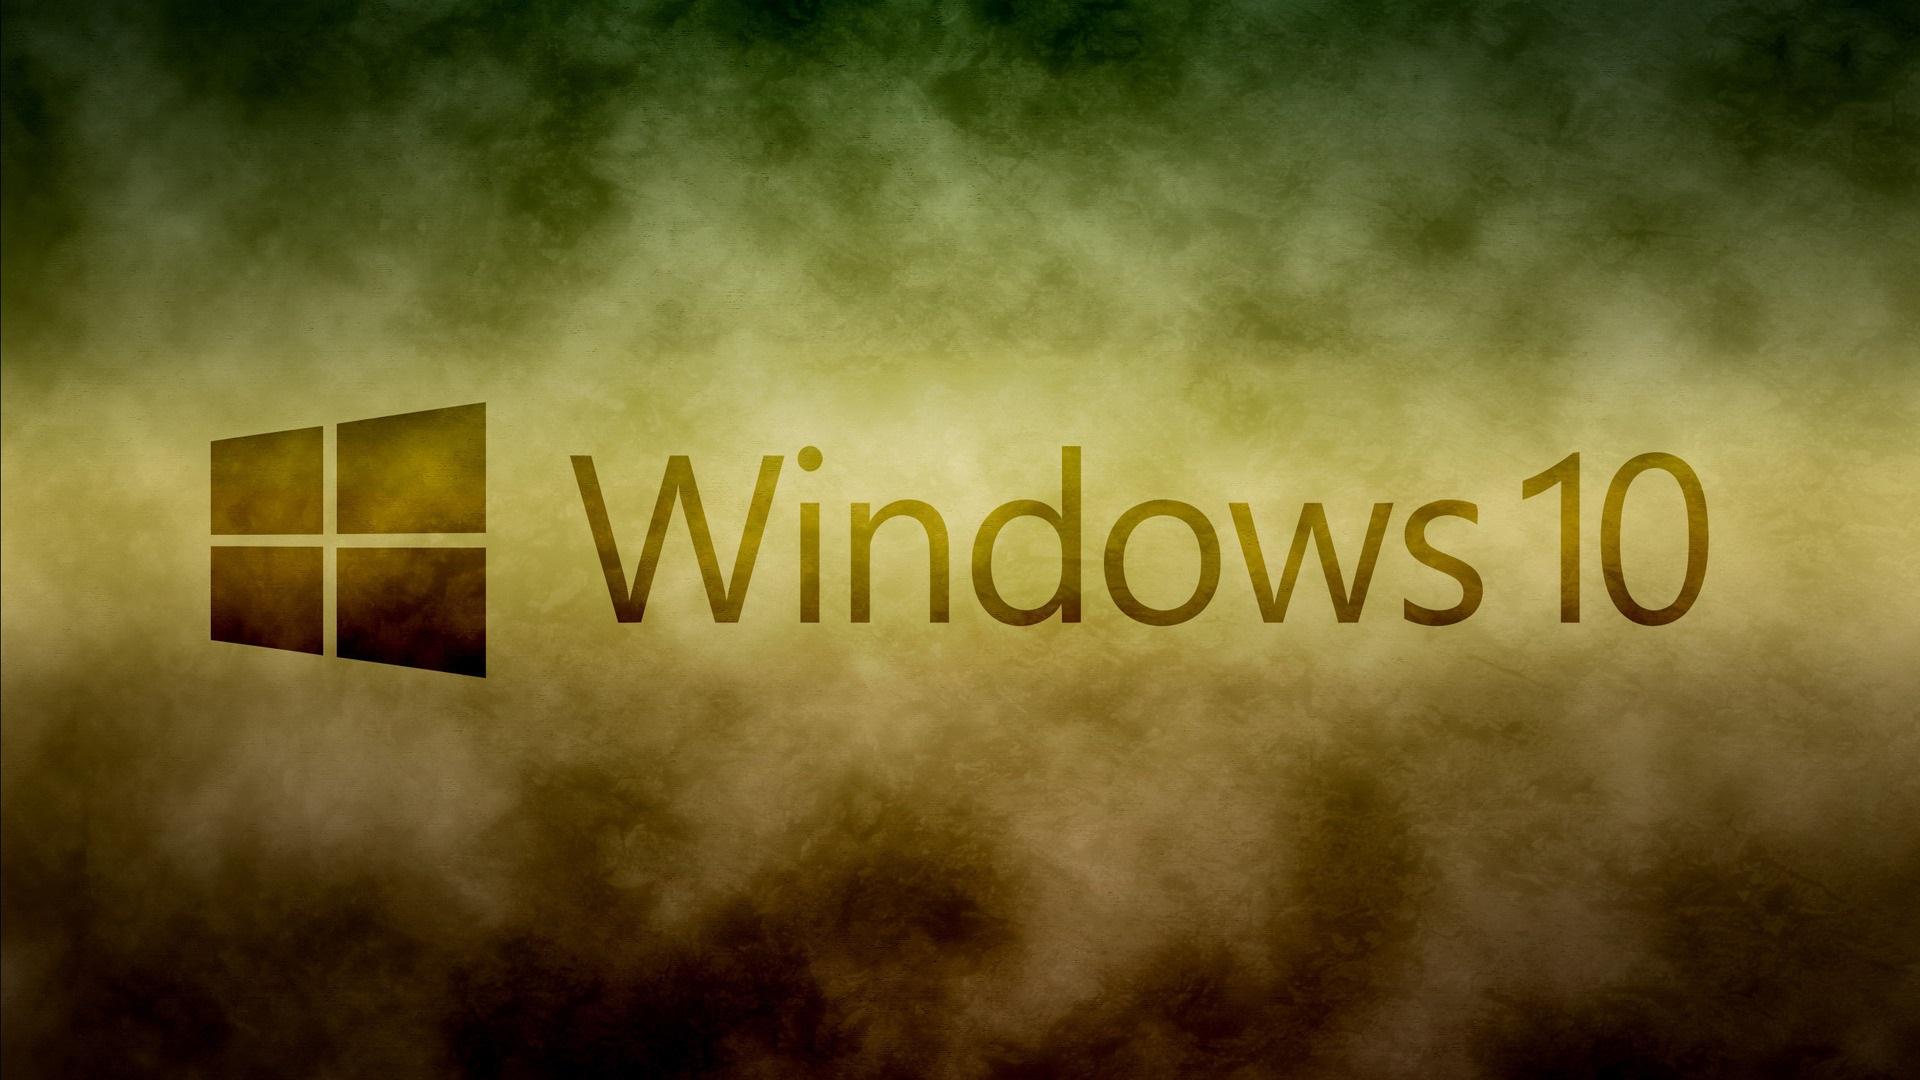 windows 10 wallpaper hd,text,font,sky,atmosphere,logo